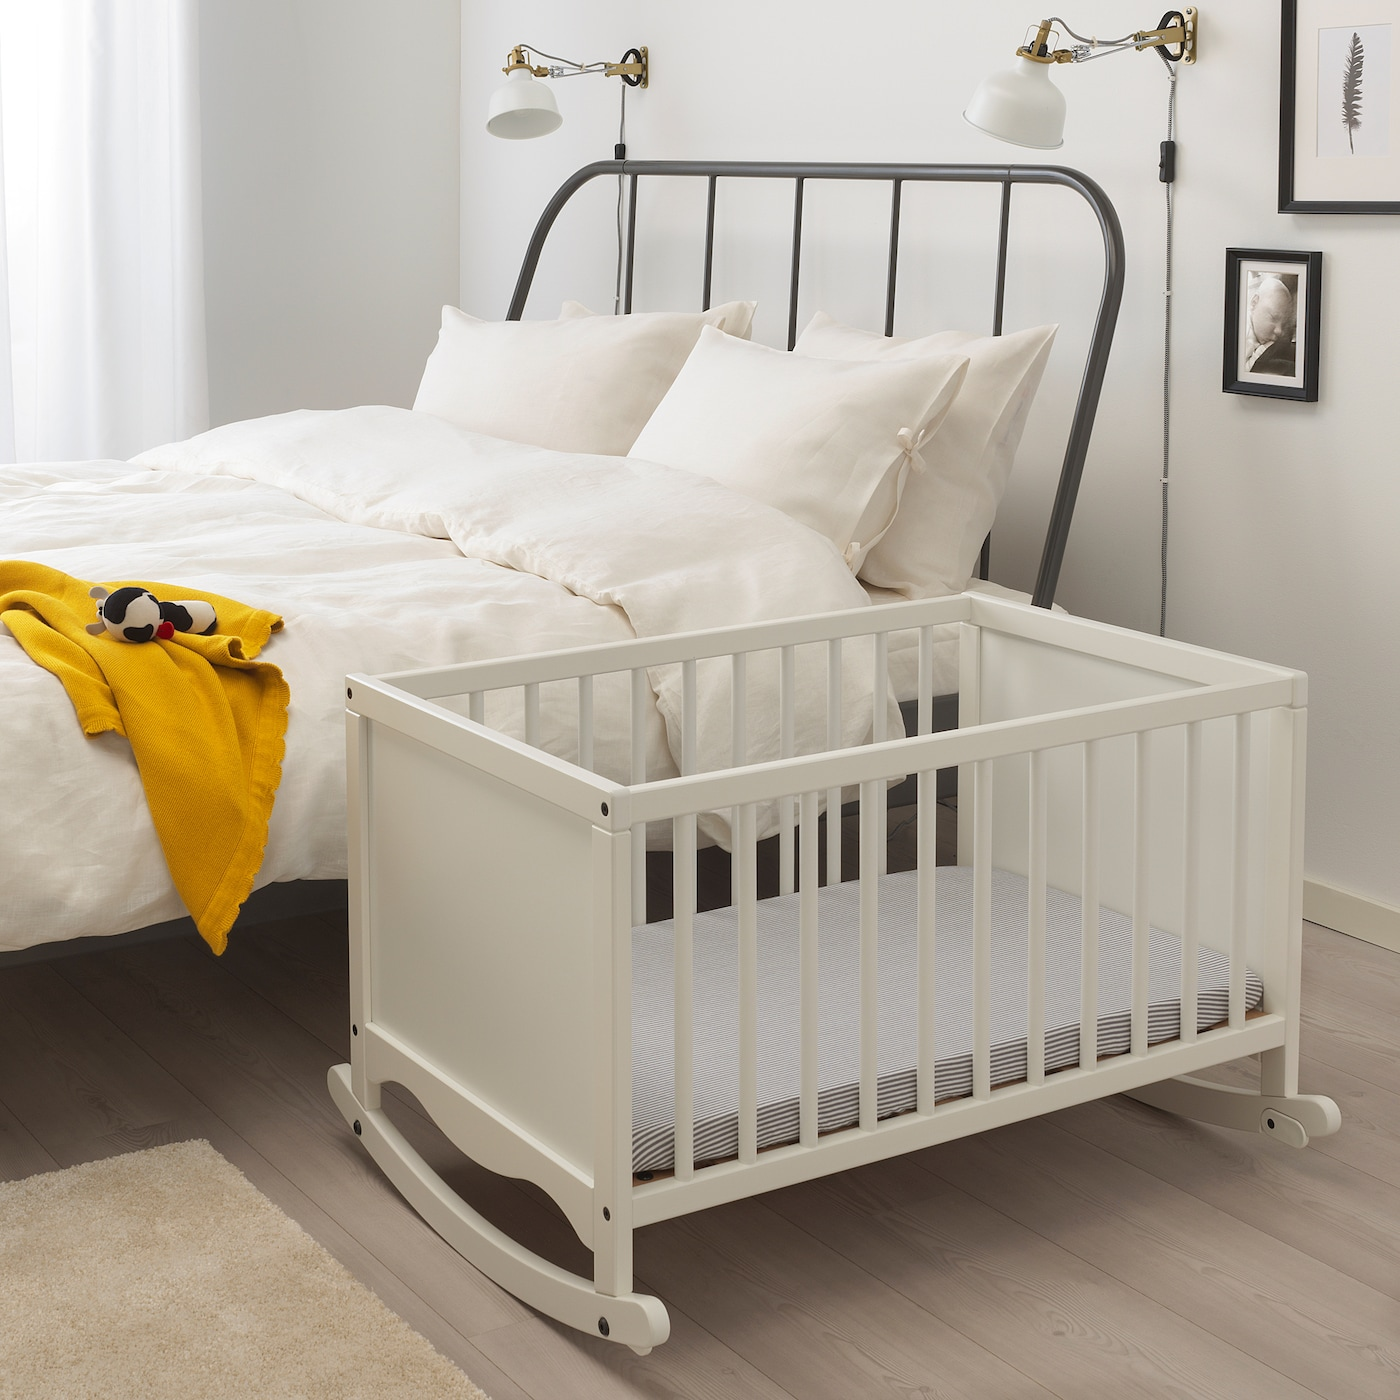 SOLGUL Cradle with foam mattress, white, 66x84 cm